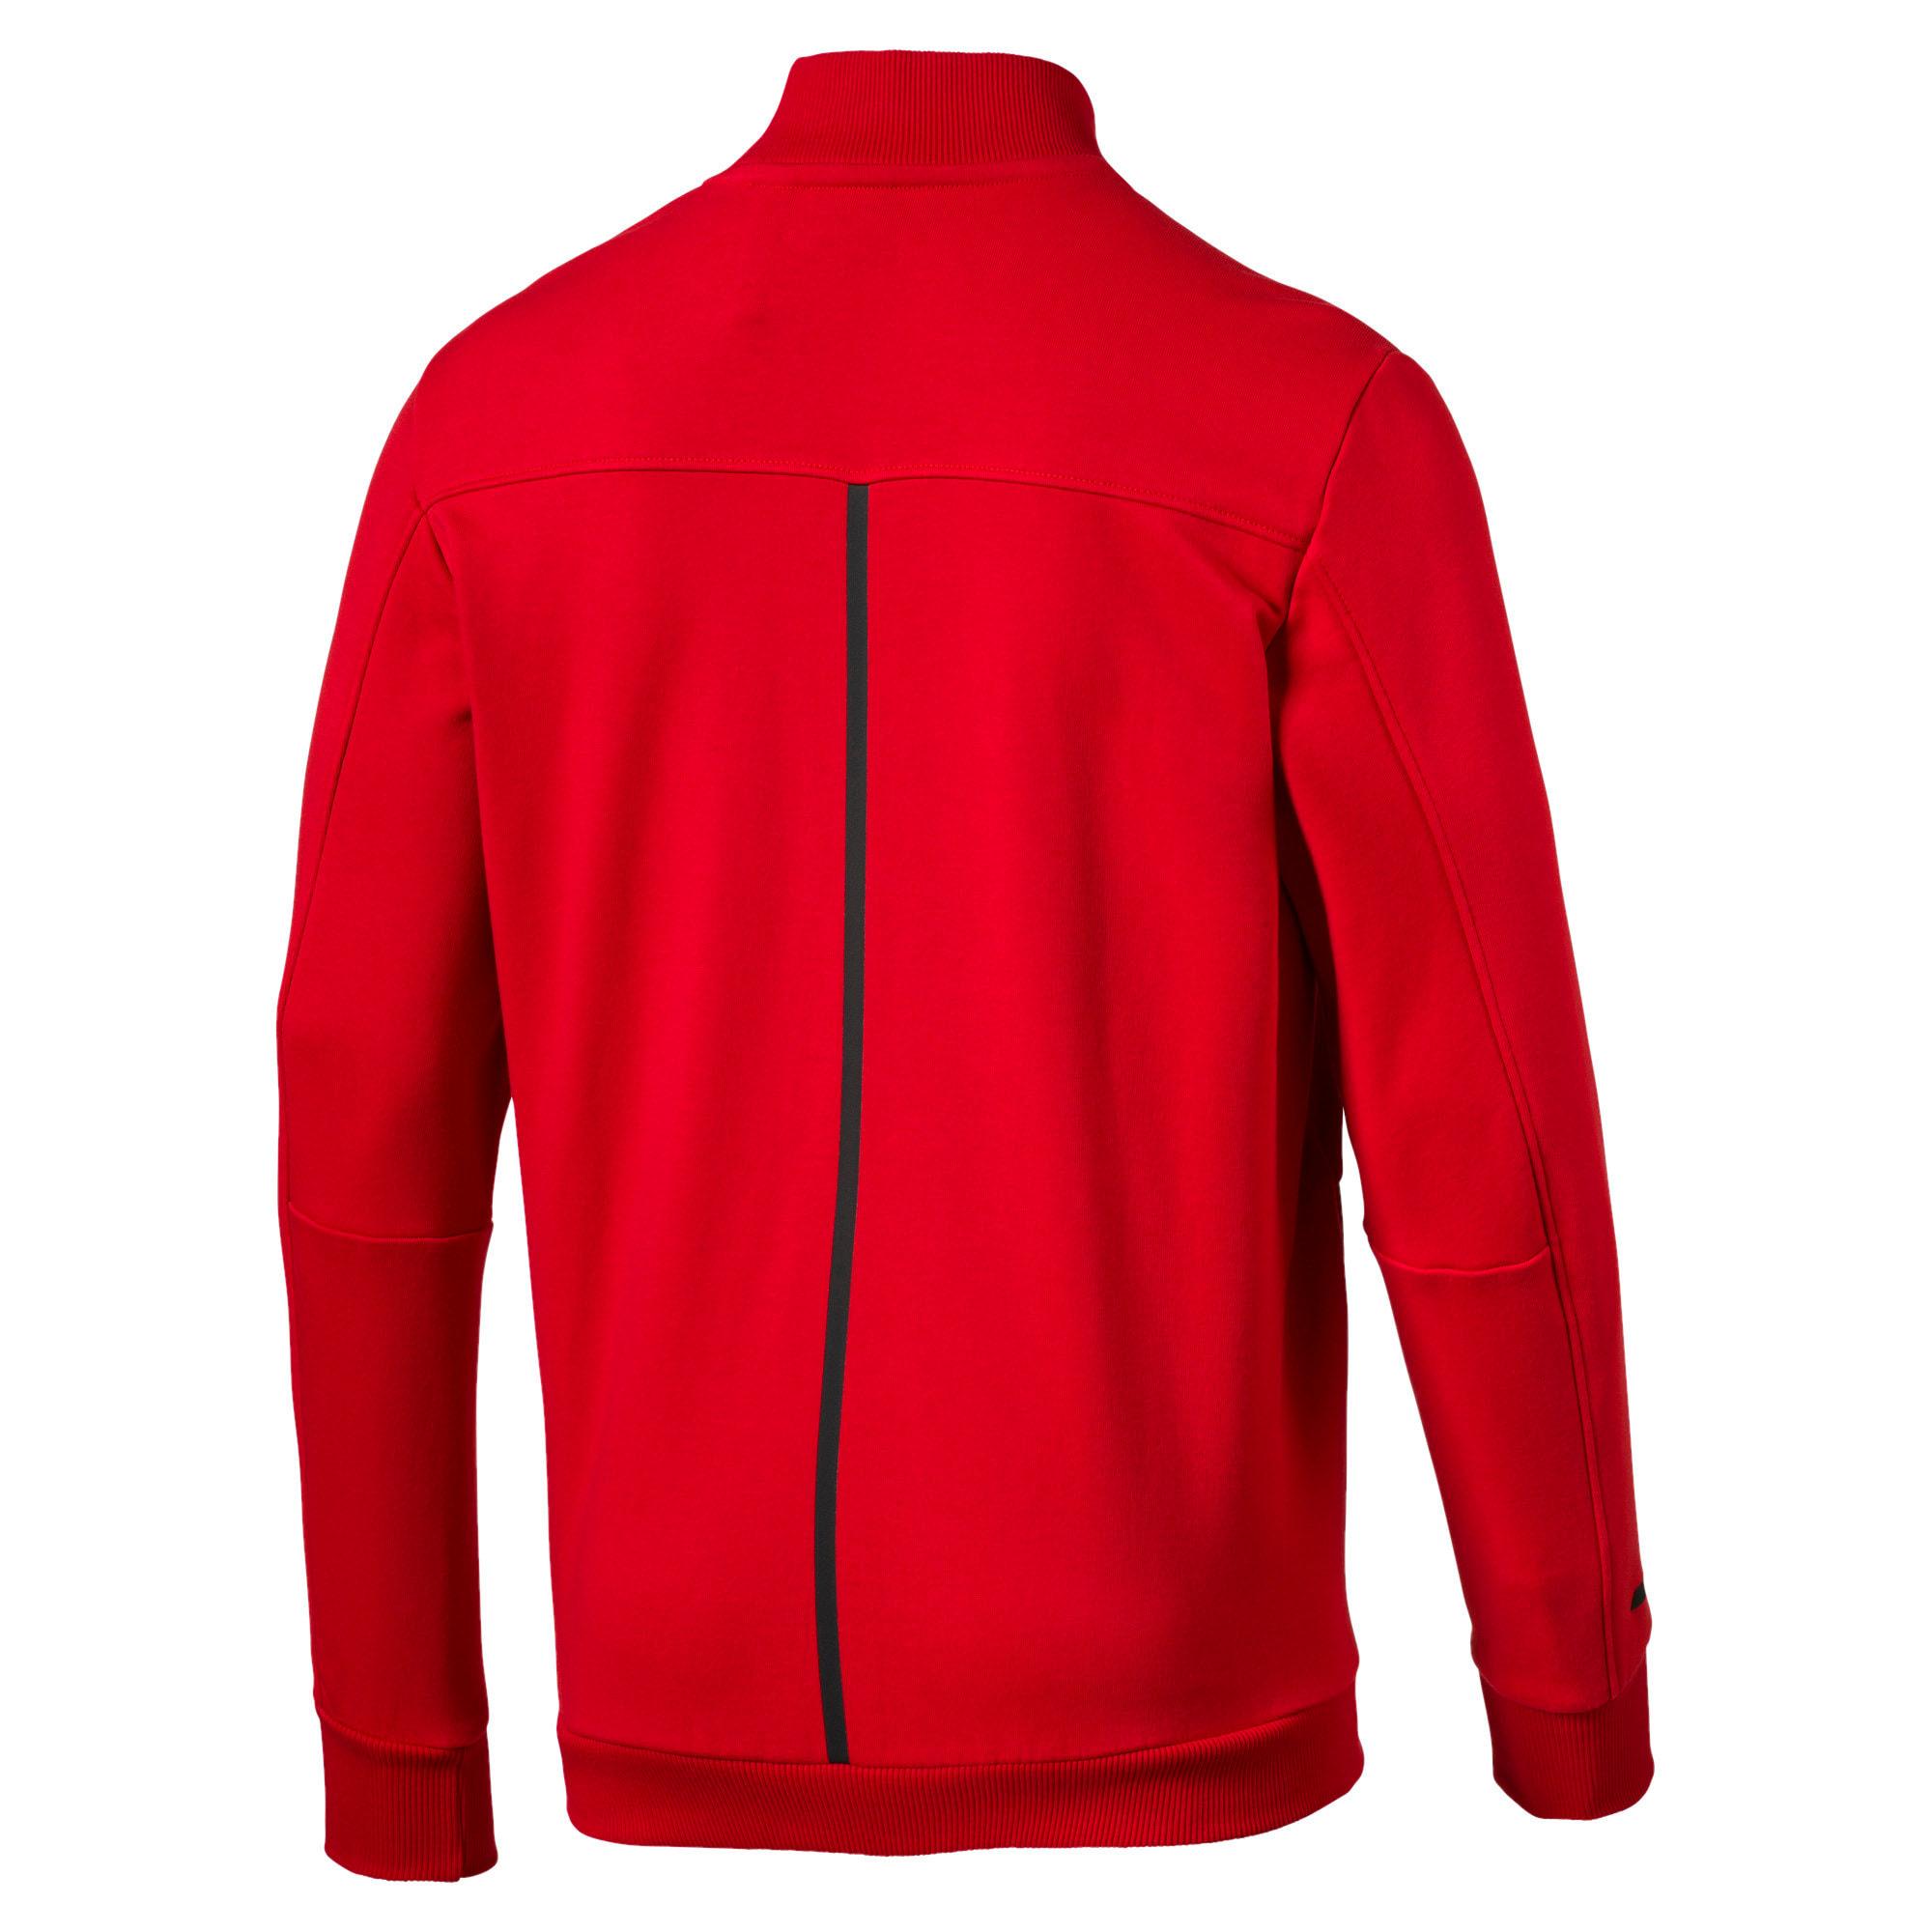 Thumbnail 4 of Ferrari Lifestyle Men's Sweat Jacket, Rosso Corsa, medium-IND